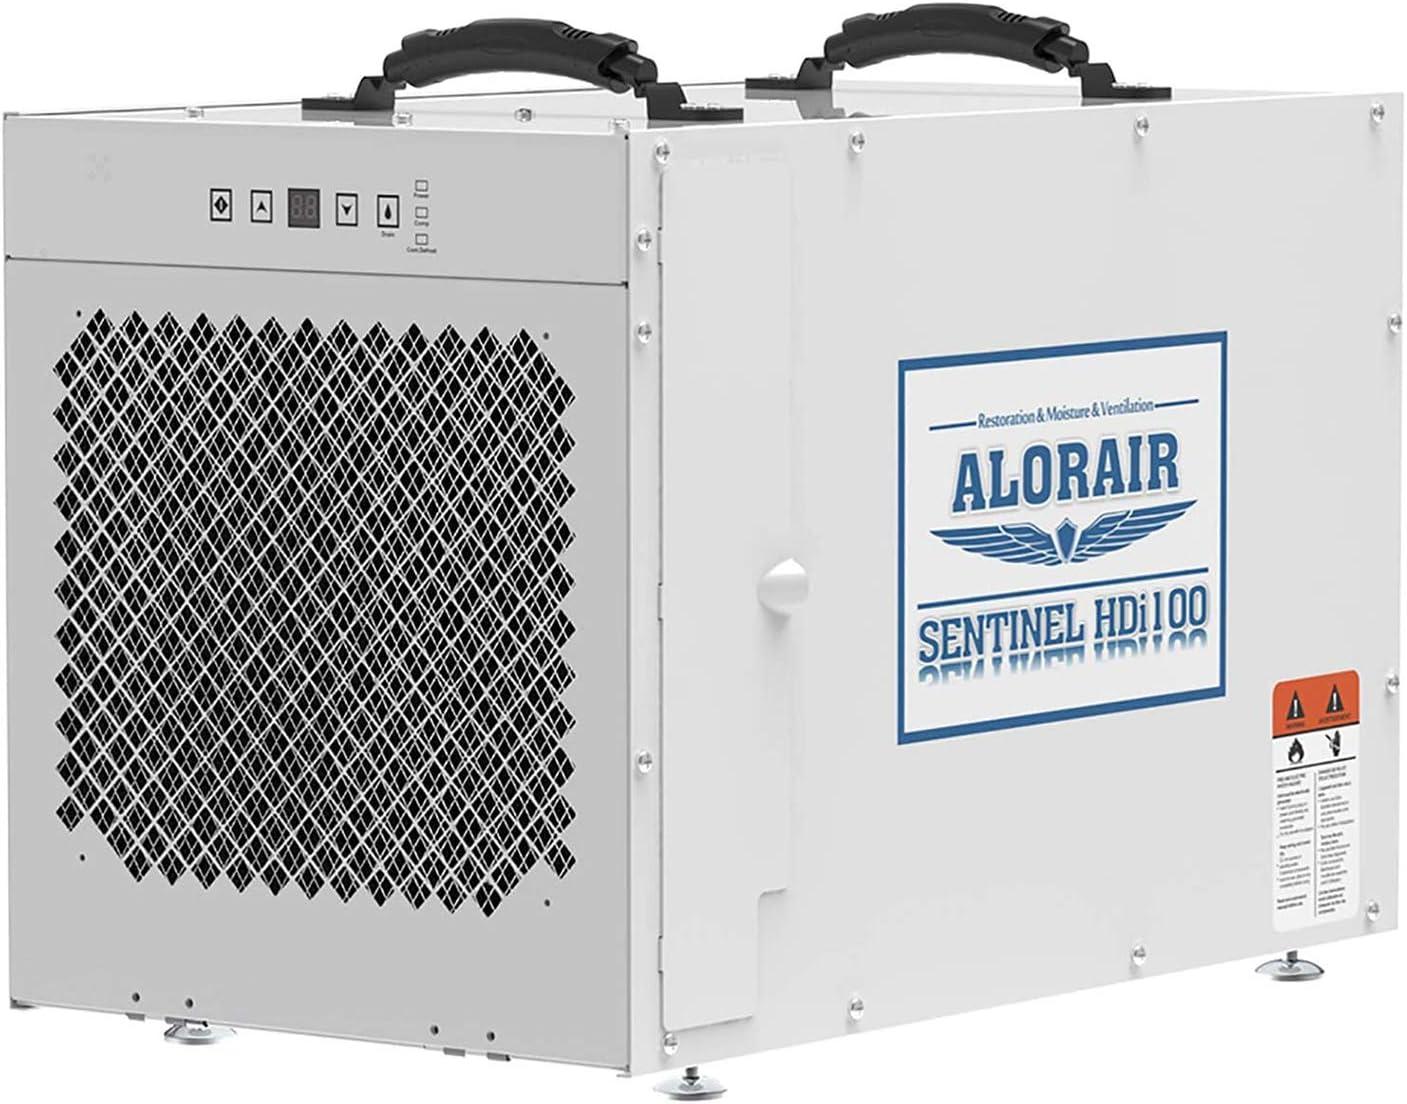 ALORAIR Tucson Mall Sentinel HDi100 Commercial Dehumidifier Max 81% OFF 220 P with Pump